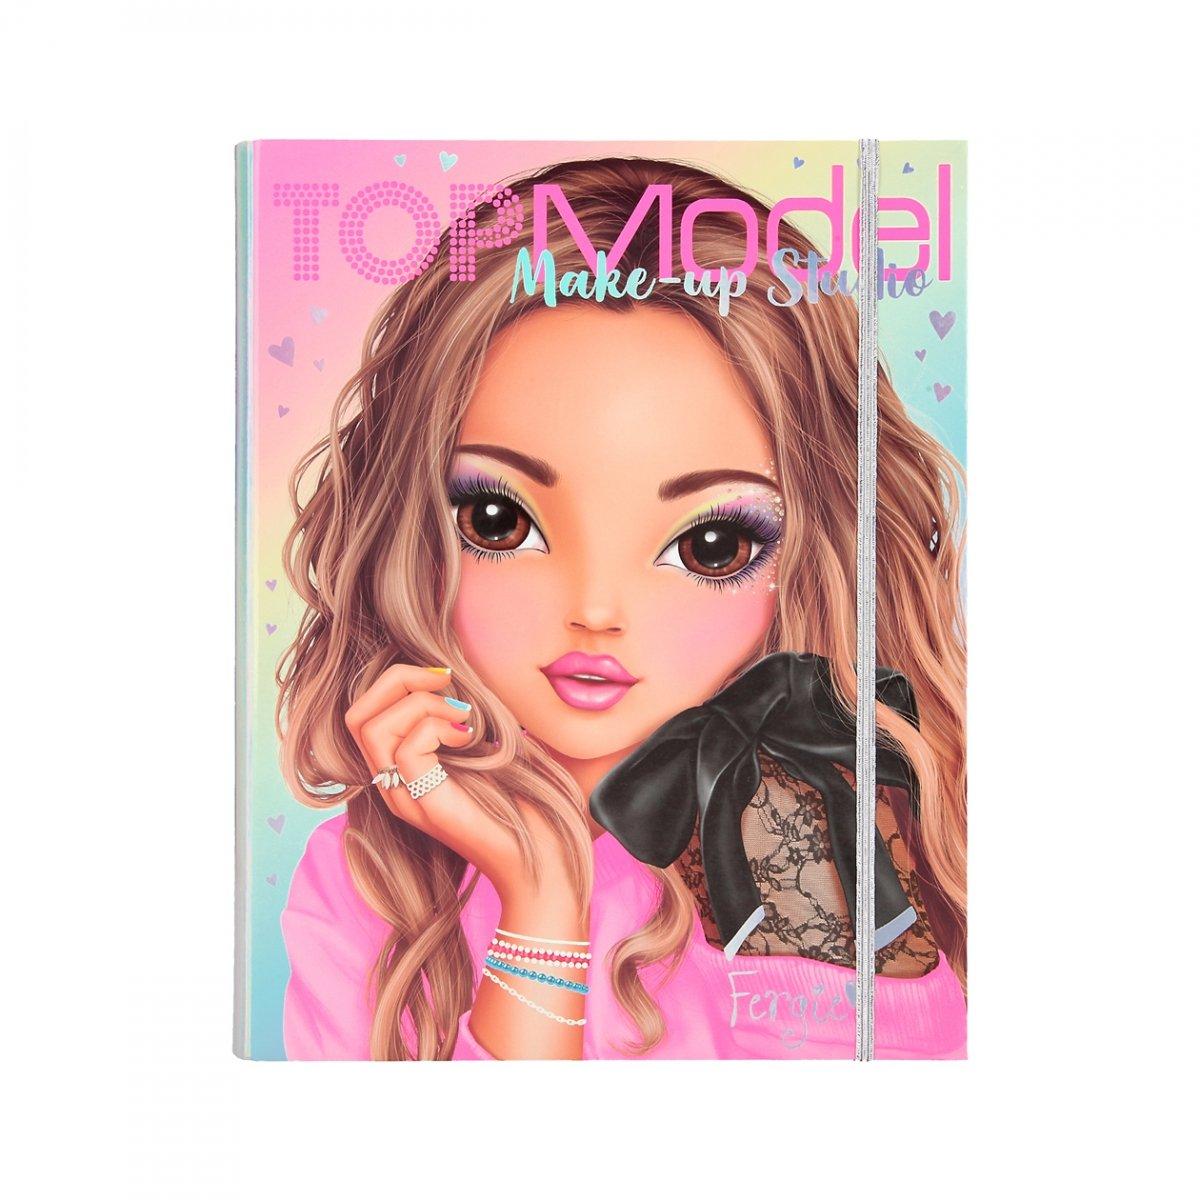 Top Model - Make-Up Studio (11266)